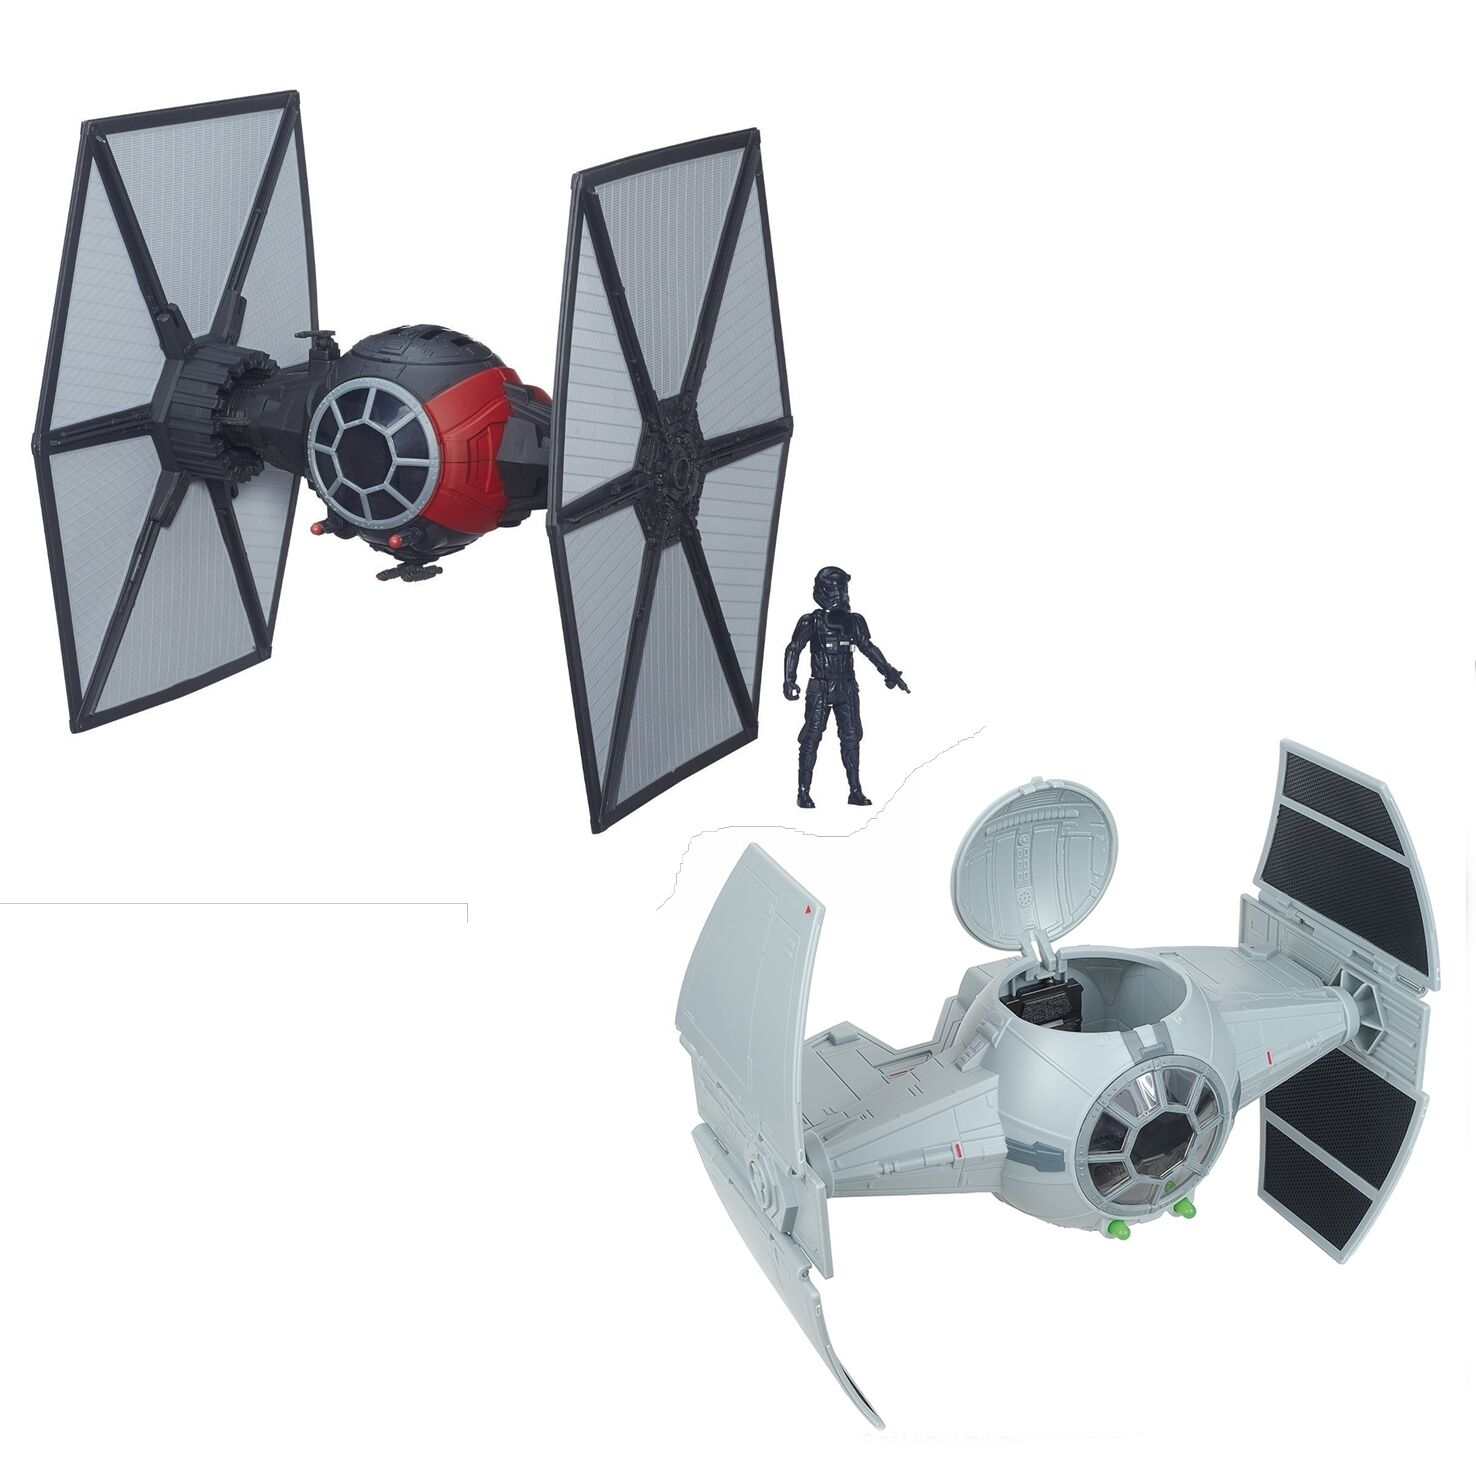 STAR WARS Rebels & Force Awakens TIE FIGHTER toy vehicle Bundle for 4